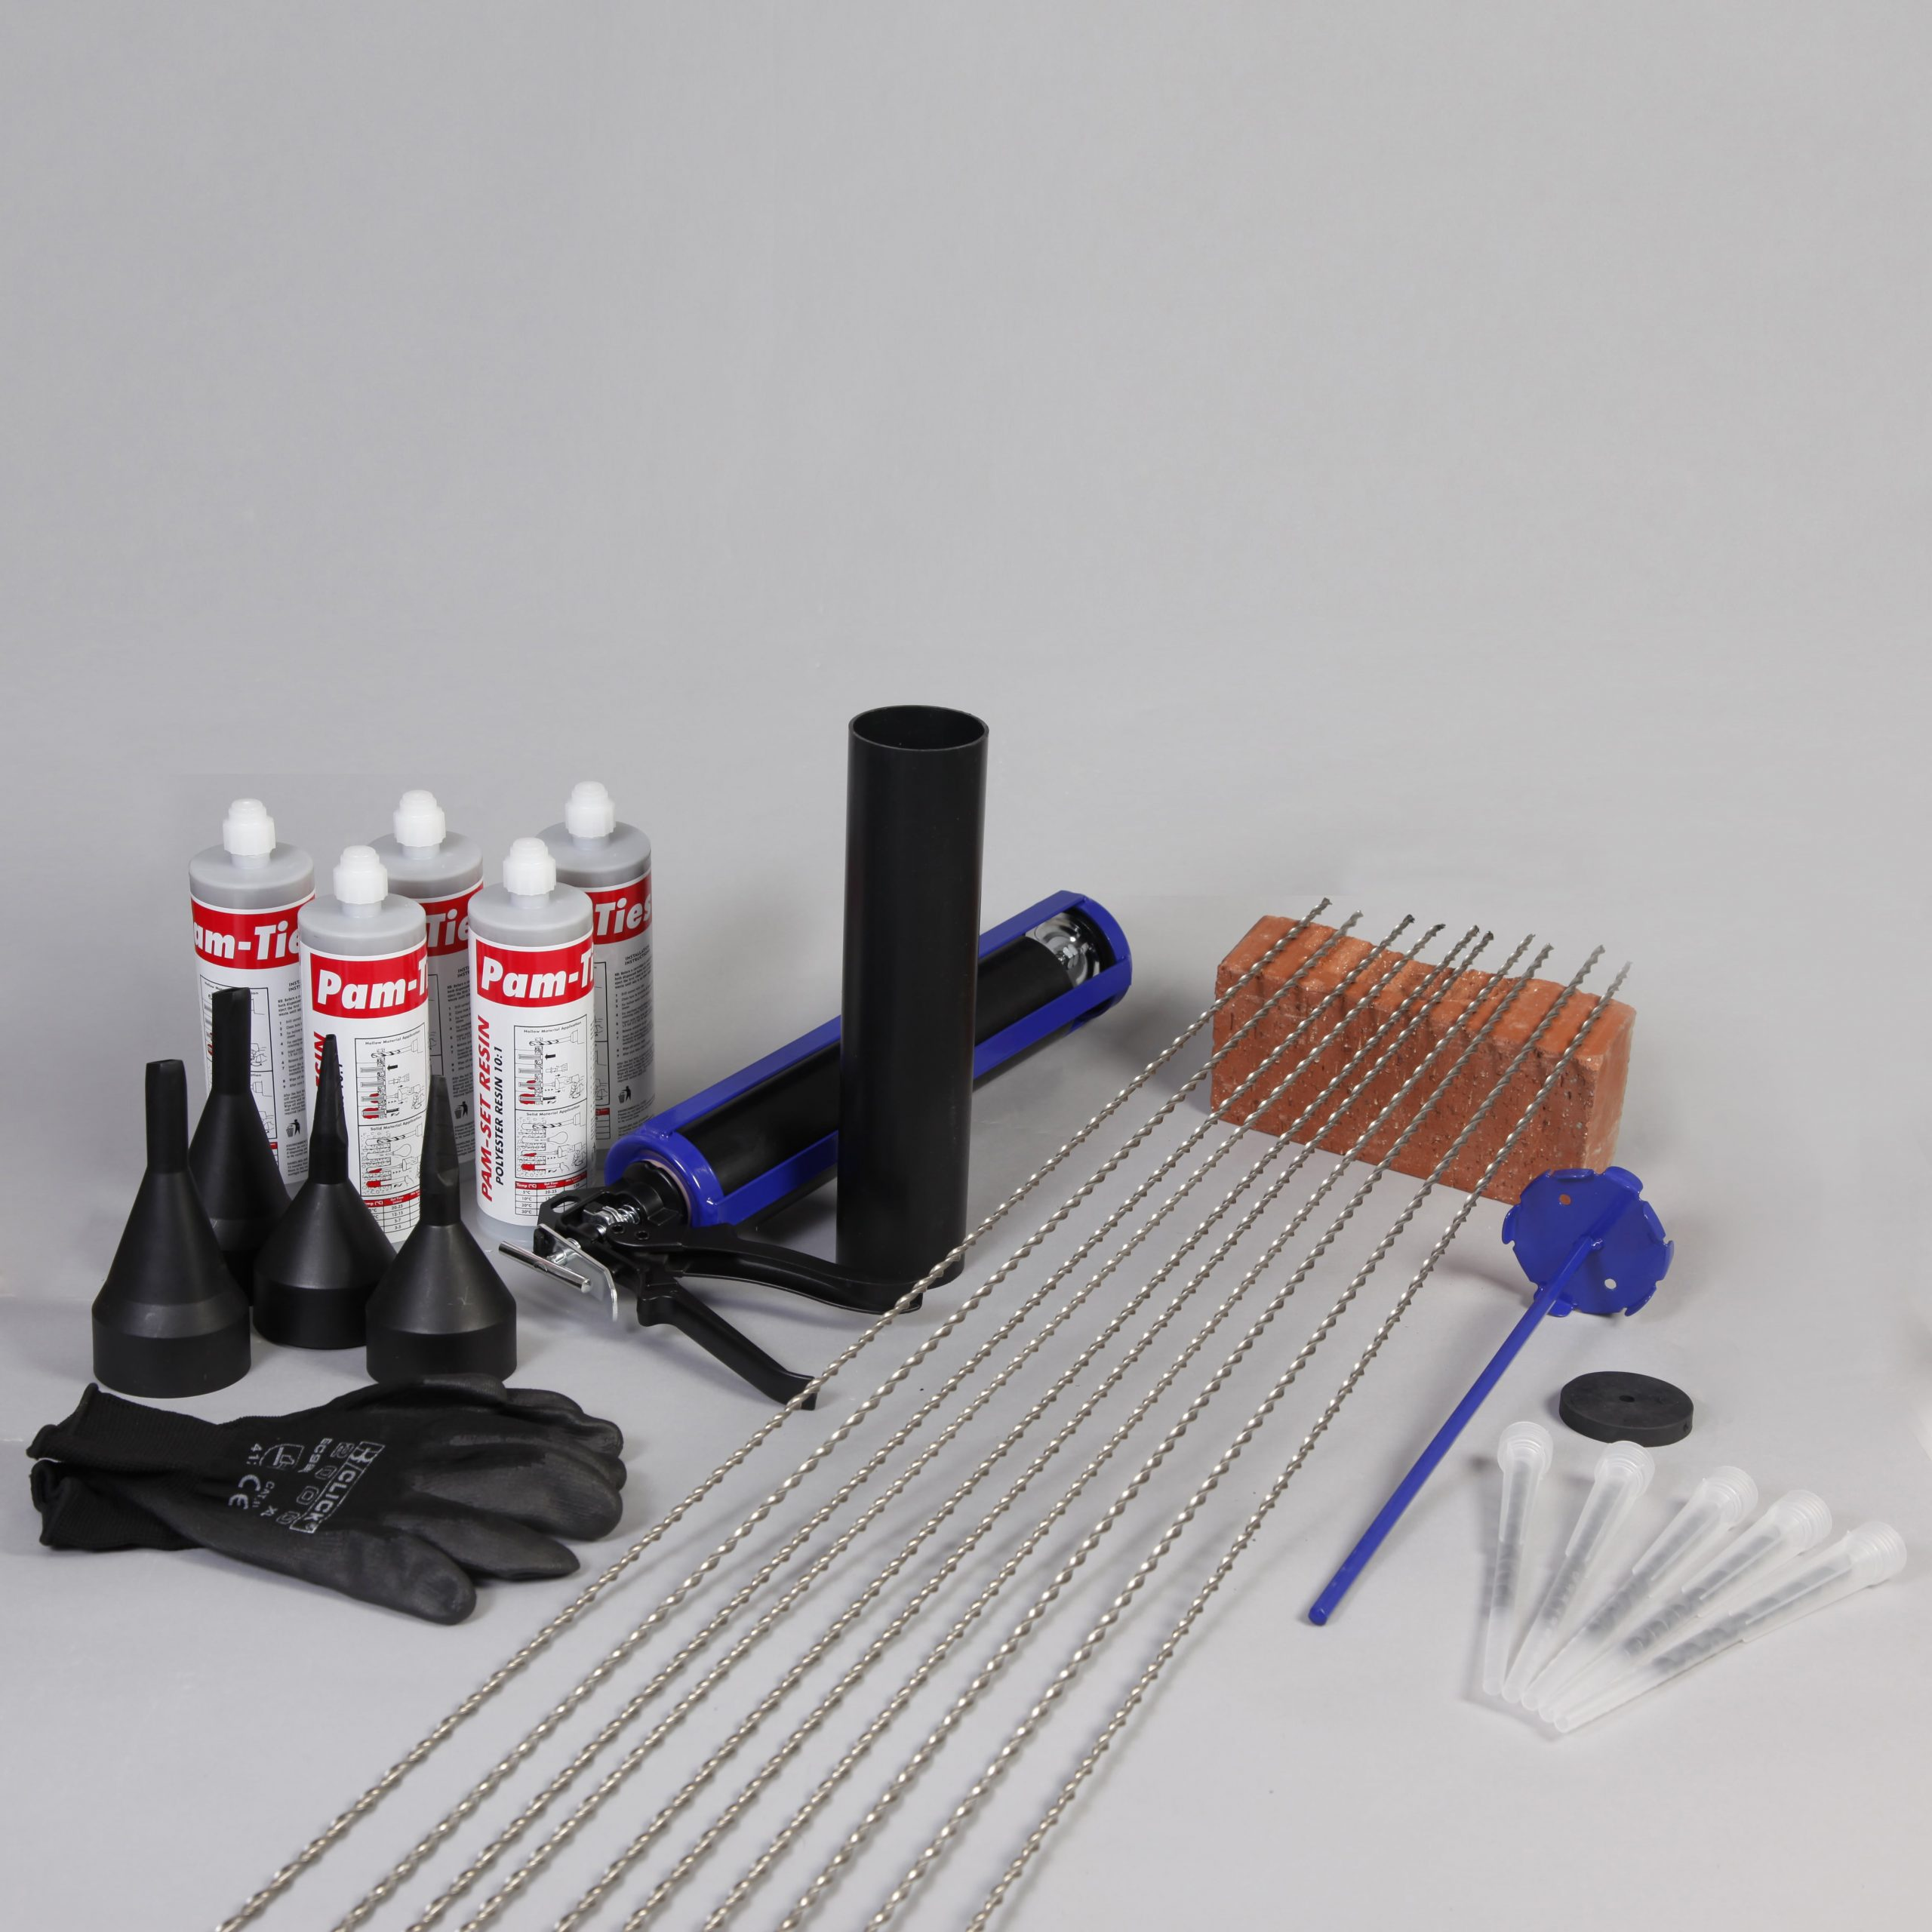 heli-crack-stitching-kit-min